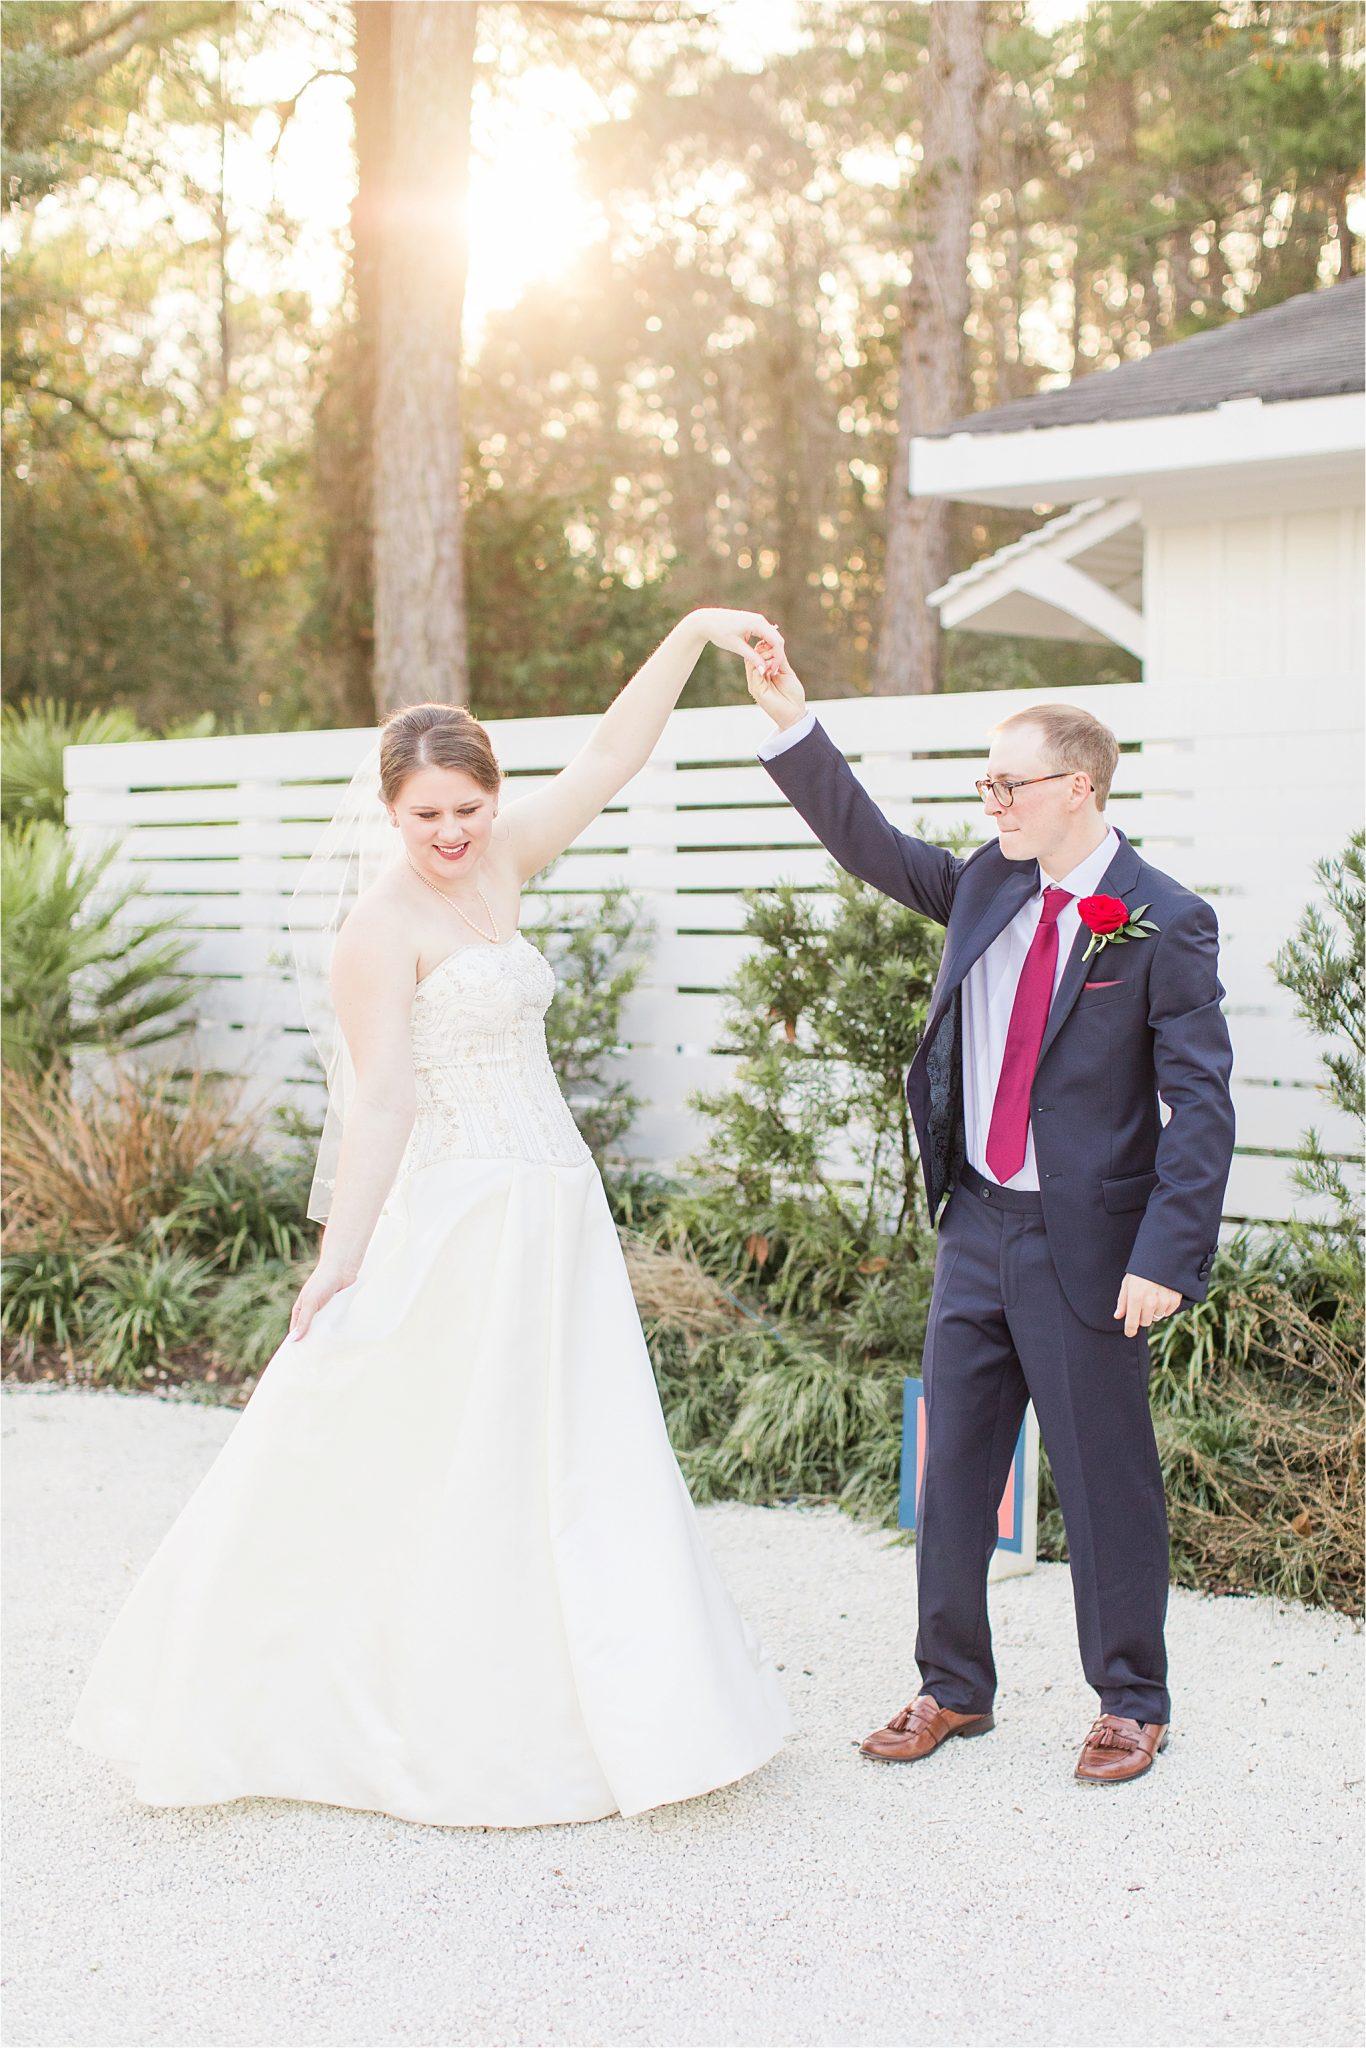 Alabama Wedding Photographer-Little Point Clear Winter Wedding-Meri Beth + Andrew-Bride and Groom